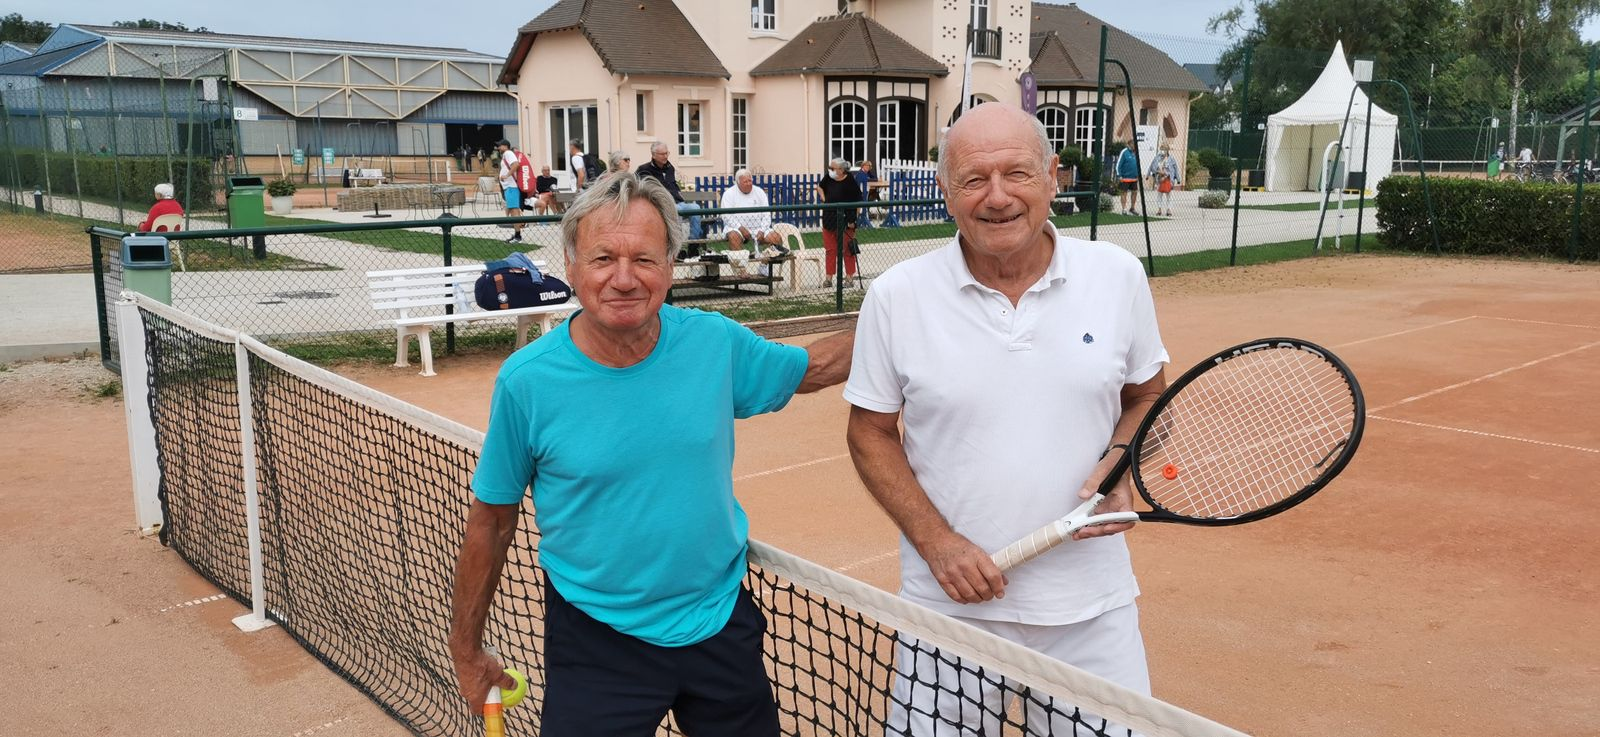 Christian Sicre 30 Vernon perd contre Michel Didierjean 30 Garden Tennis de Cabourg